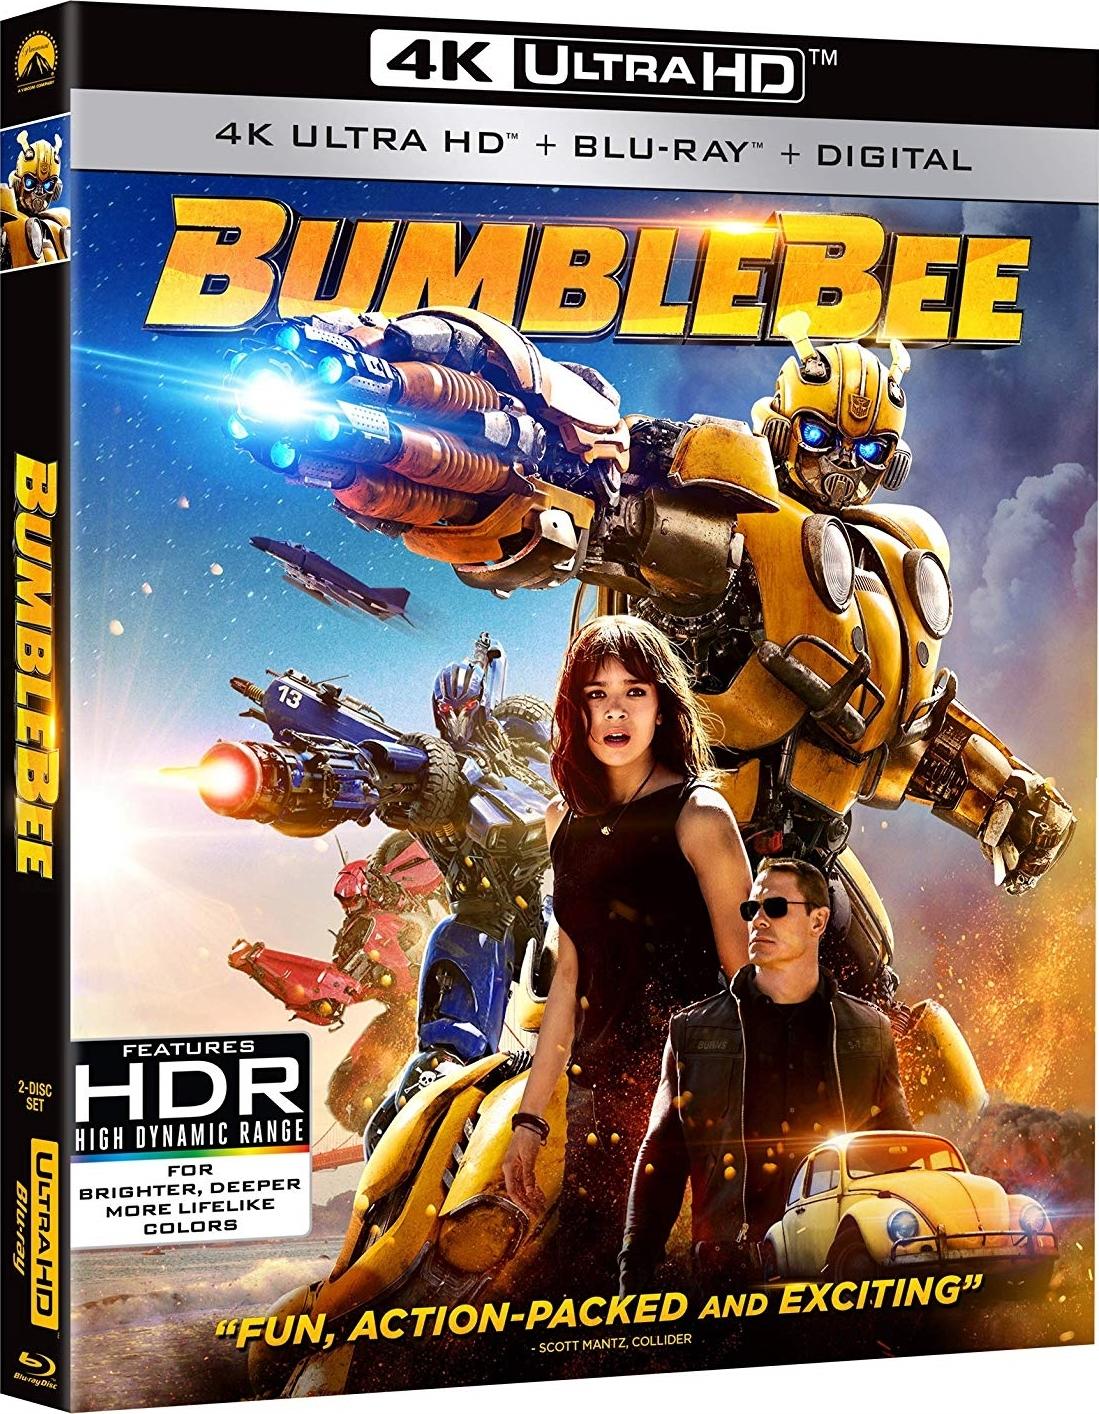 Bumblebee (2018) Blu-ray 4K :: subdivx